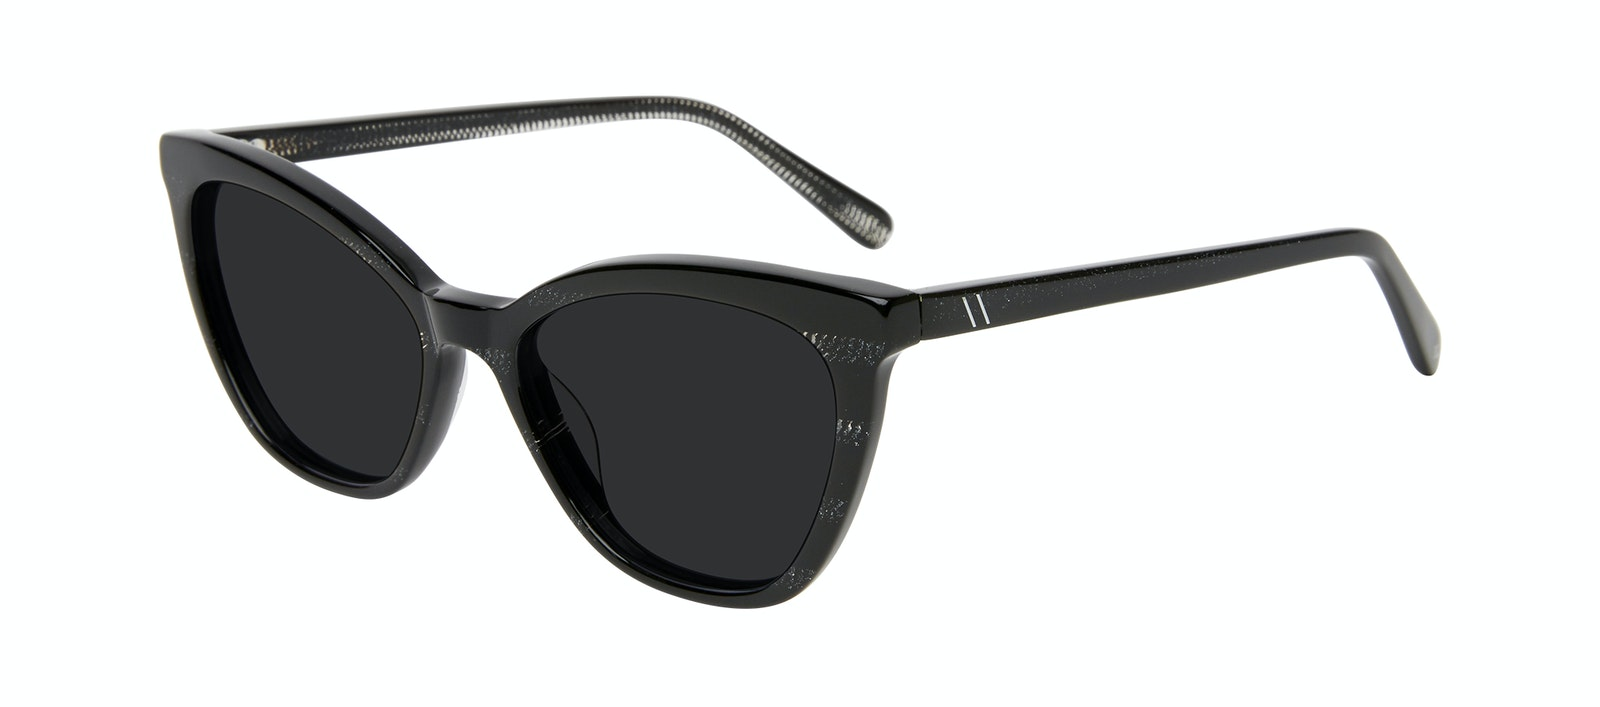 Affordable Fashion Glasses Cat Eye Sunglasses Women Elan Night Tilt